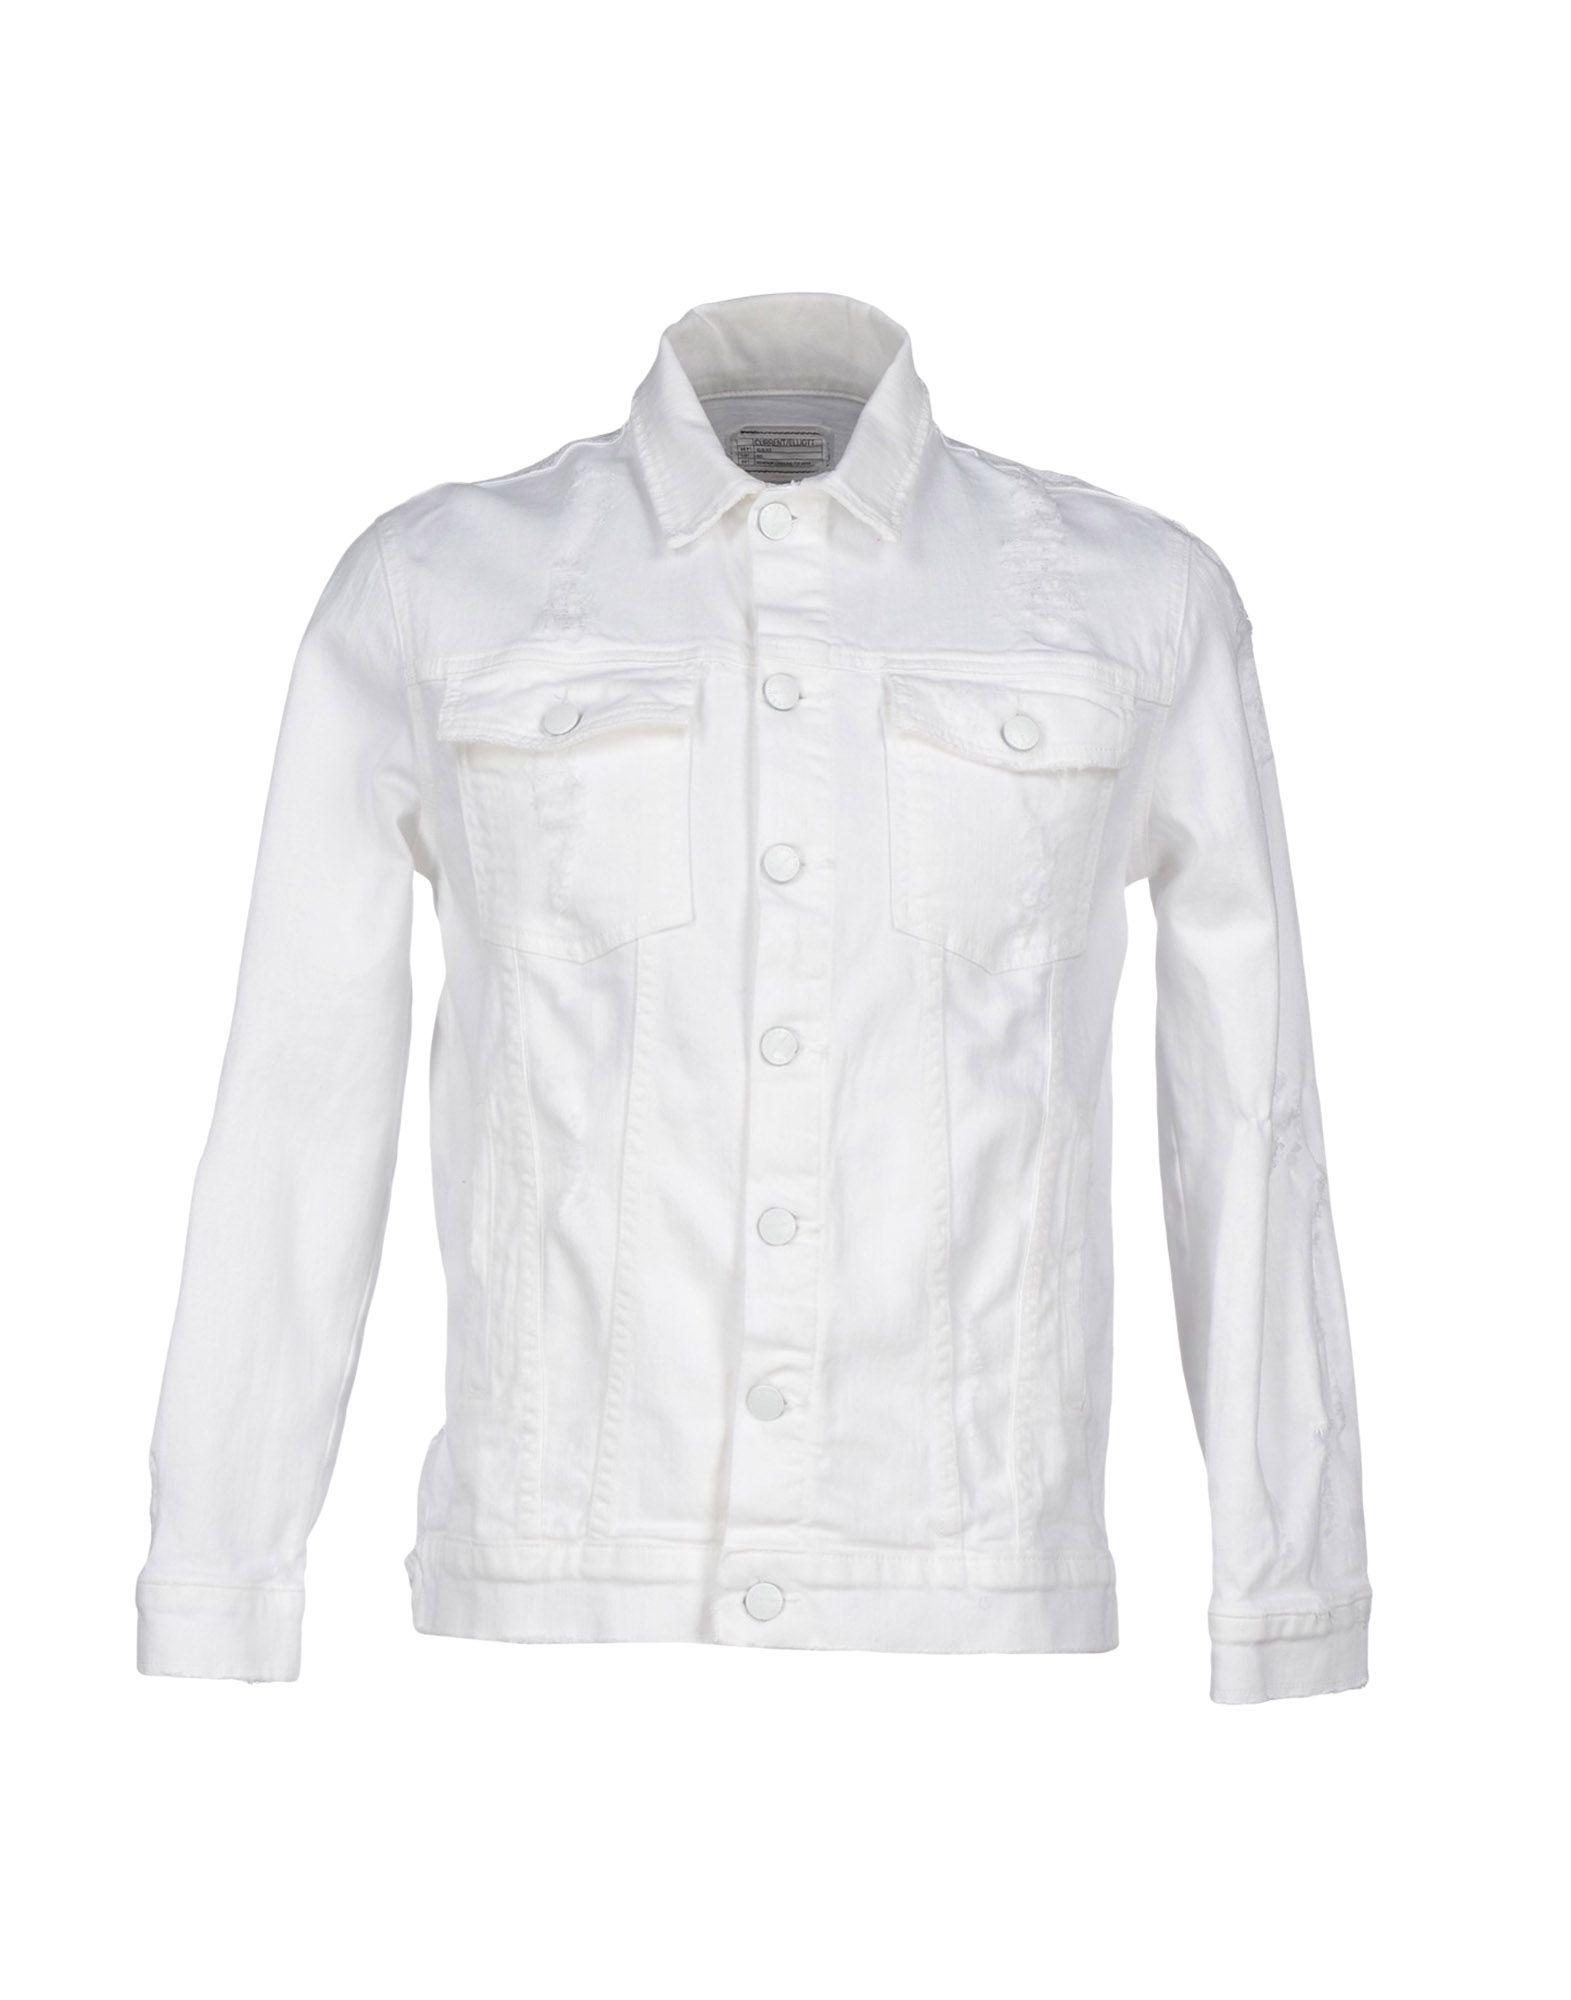 CURRENT/ELLIOTT Джинсовая верхняя одежда colmar джинсовая верхняя одежда